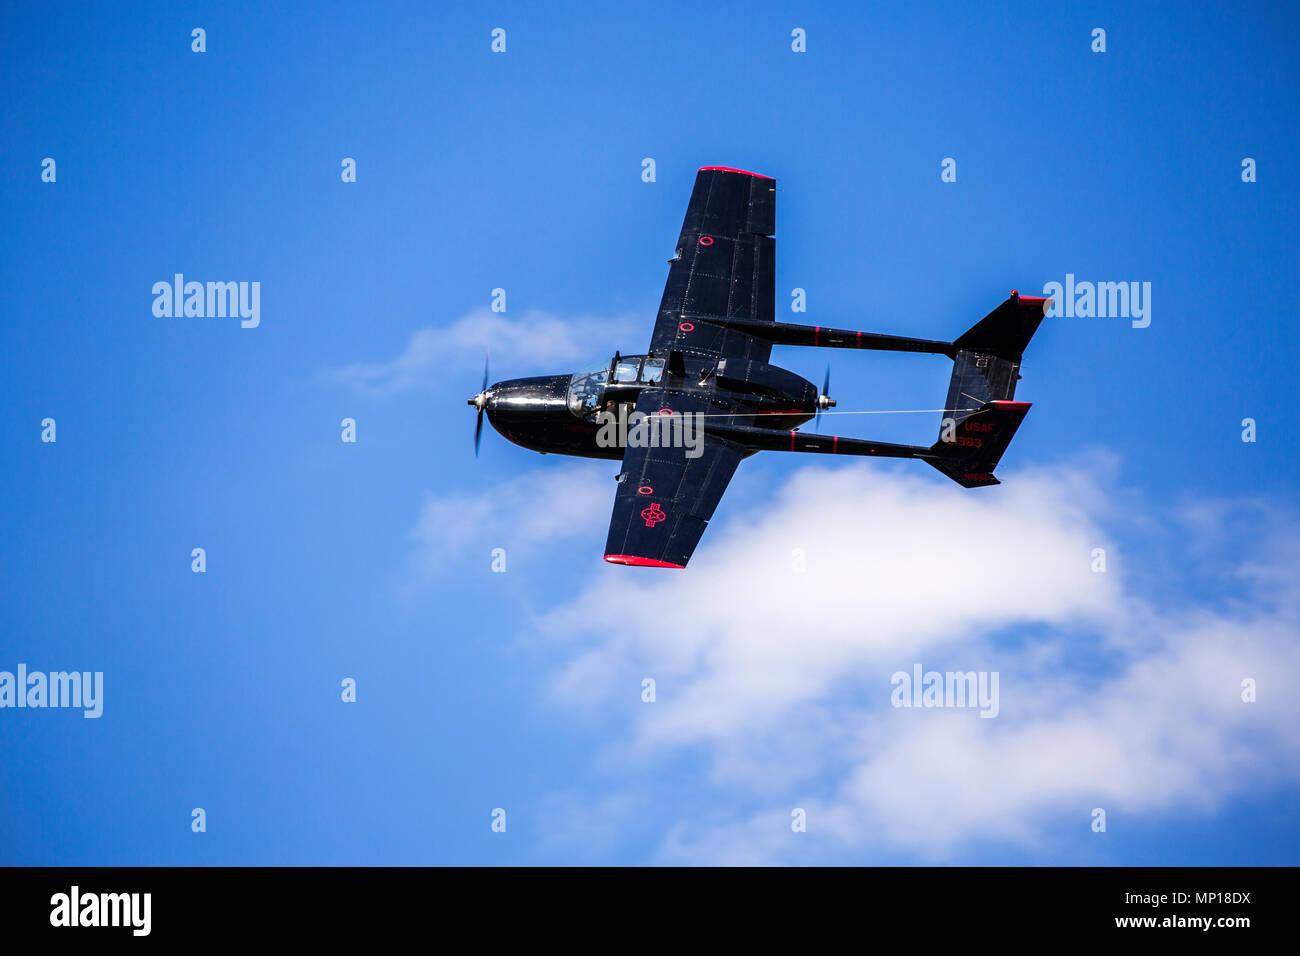 Cessna Wing Stock Photos & Cessna Wing Stock Images - Alamy